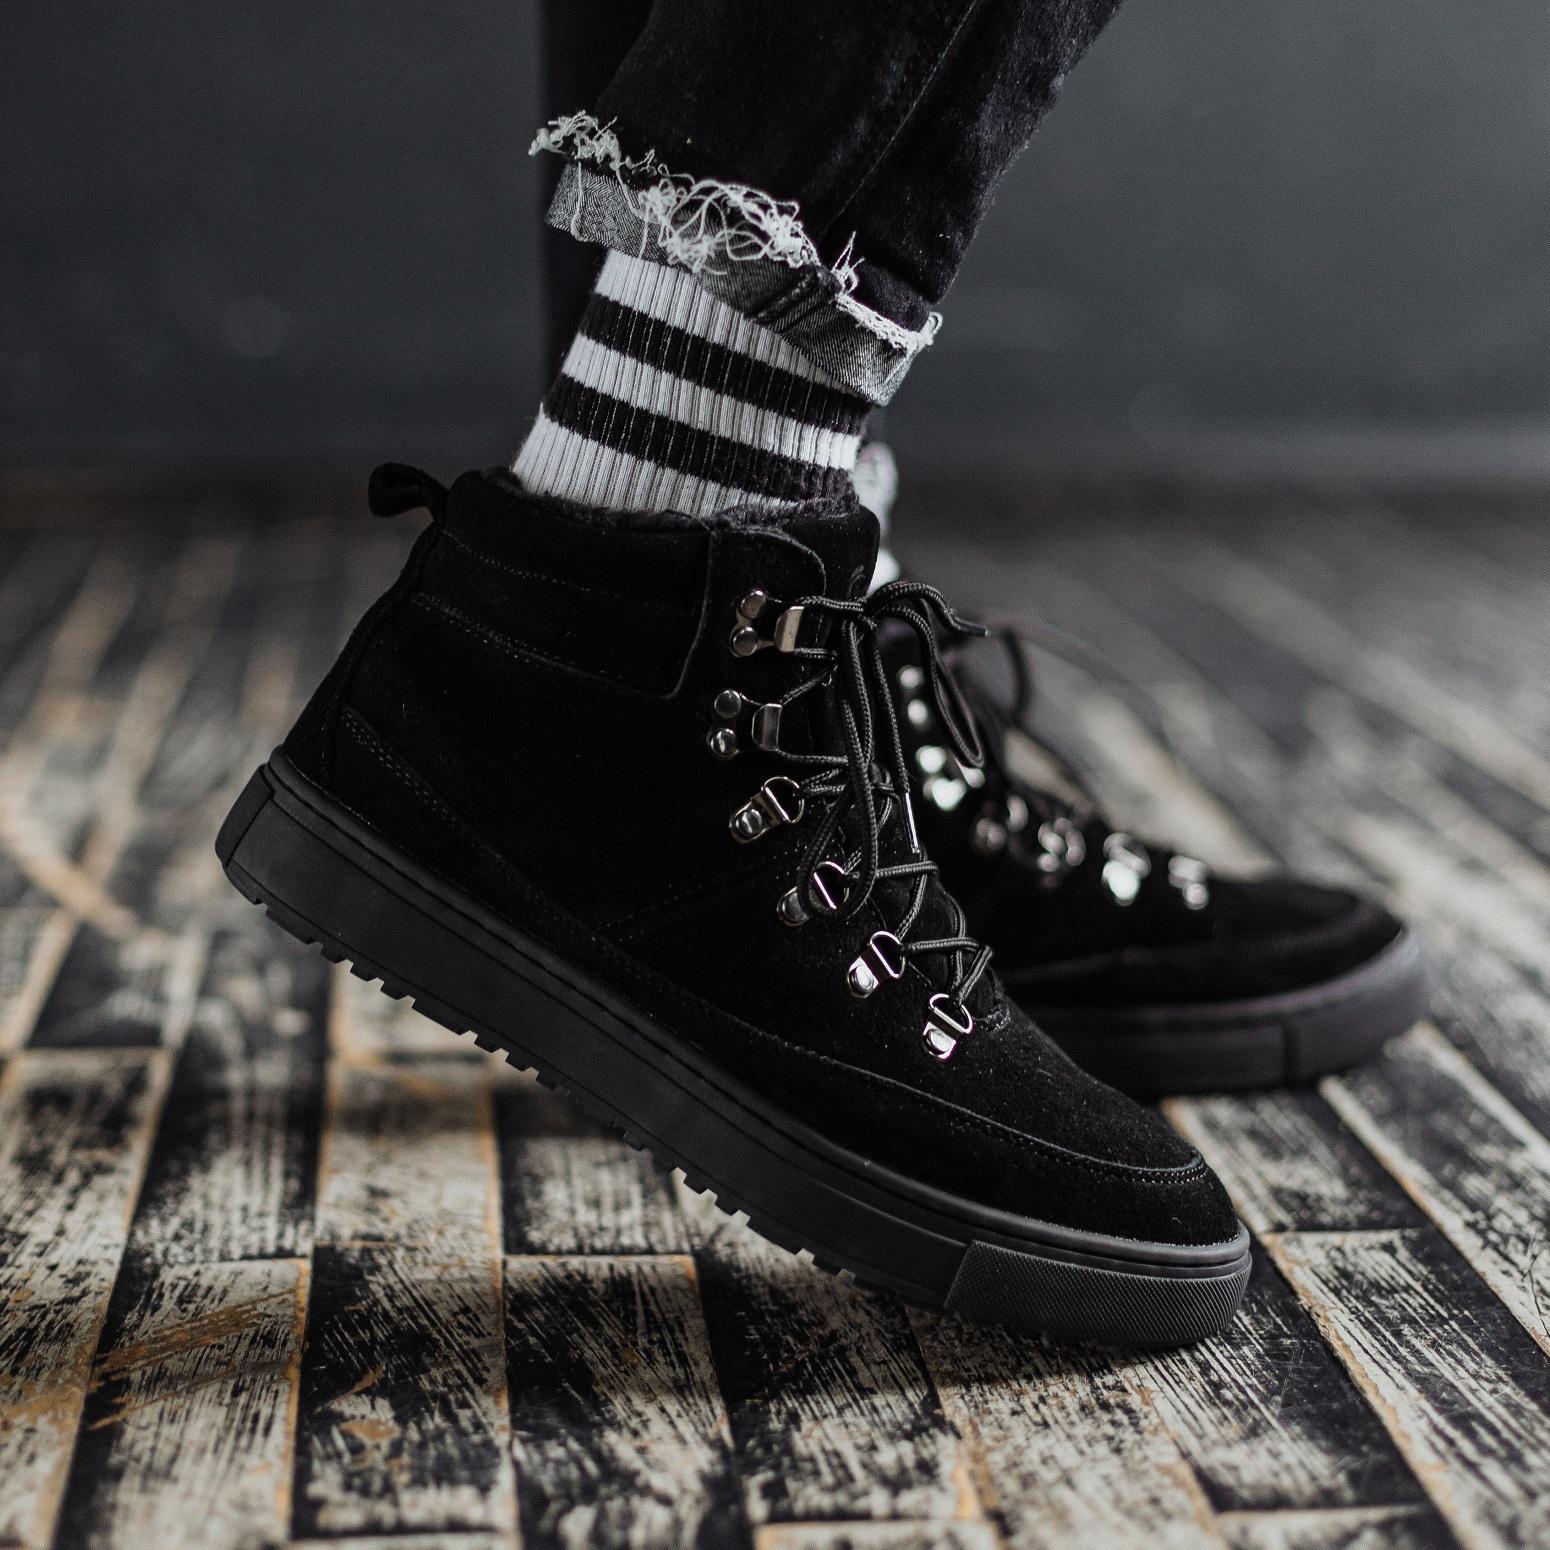 Ботинки South snike black - фото 2